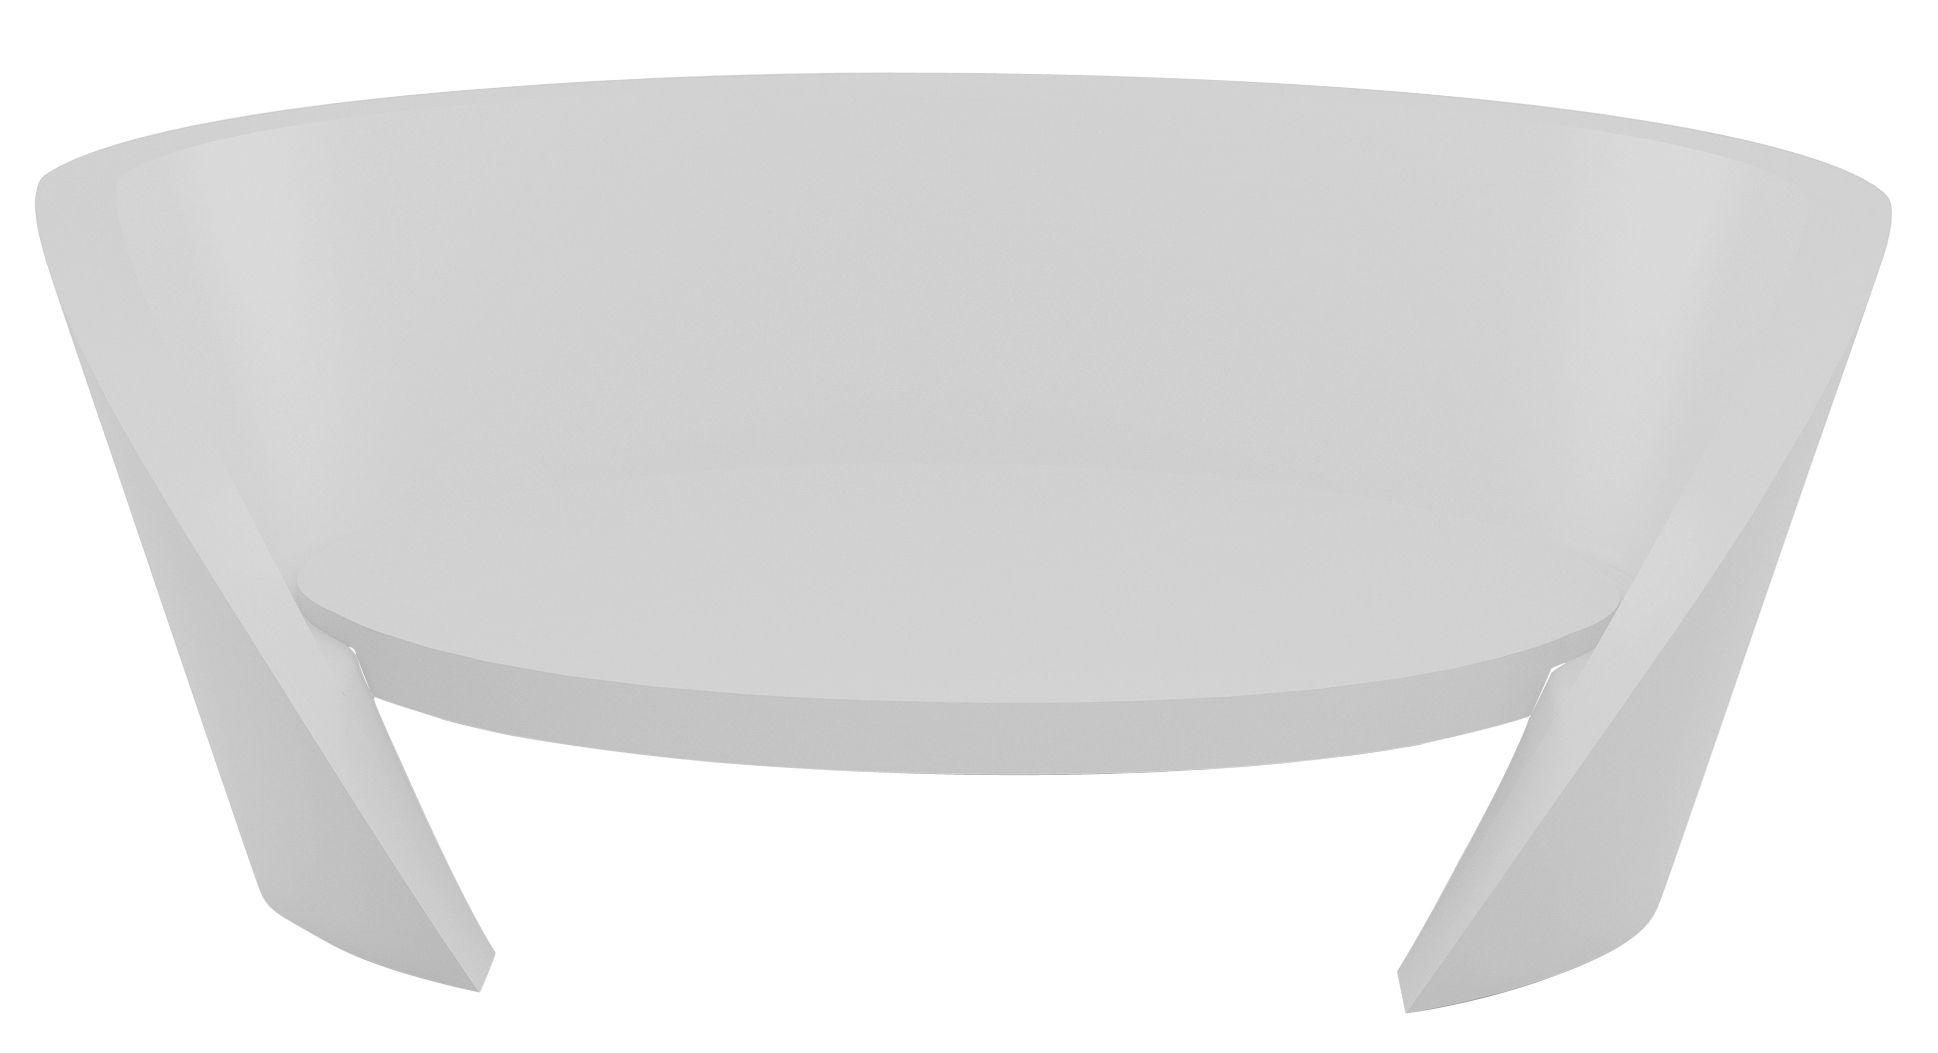 canap rap l 170 cm blanc slide. Black Bedroom Furniture Sets. Home Design Ideas